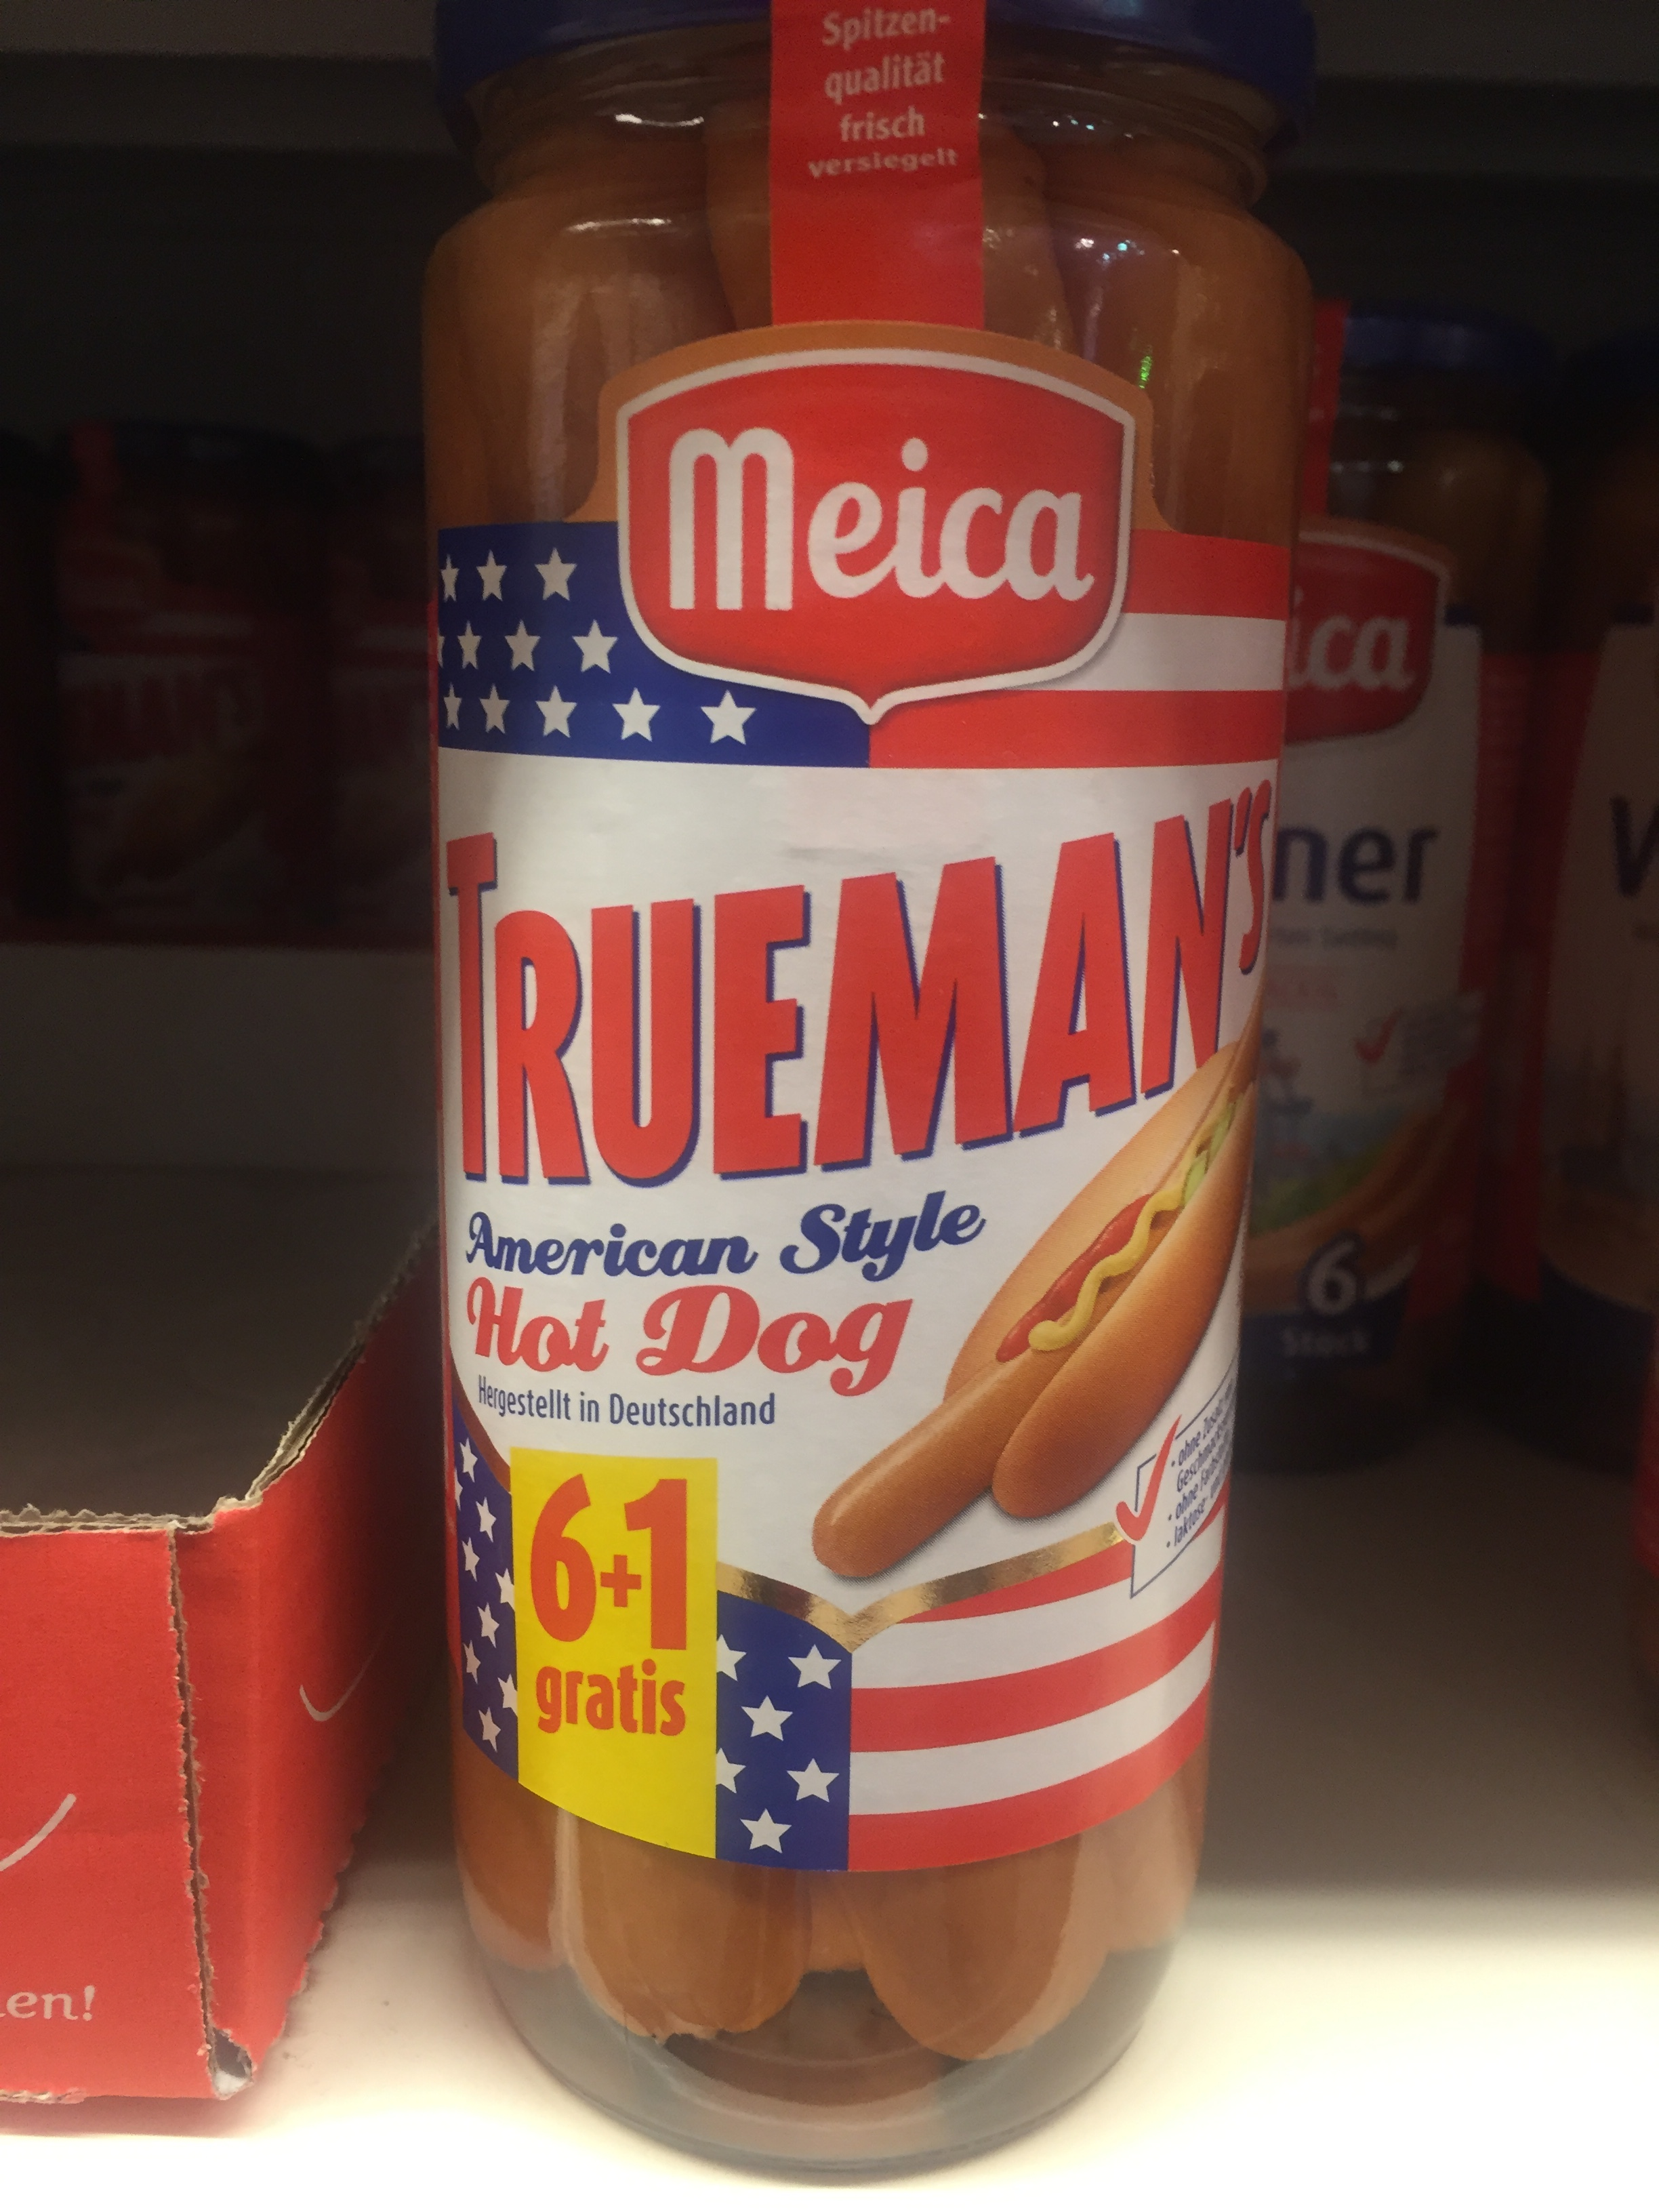 Hot dogs in a jar = american